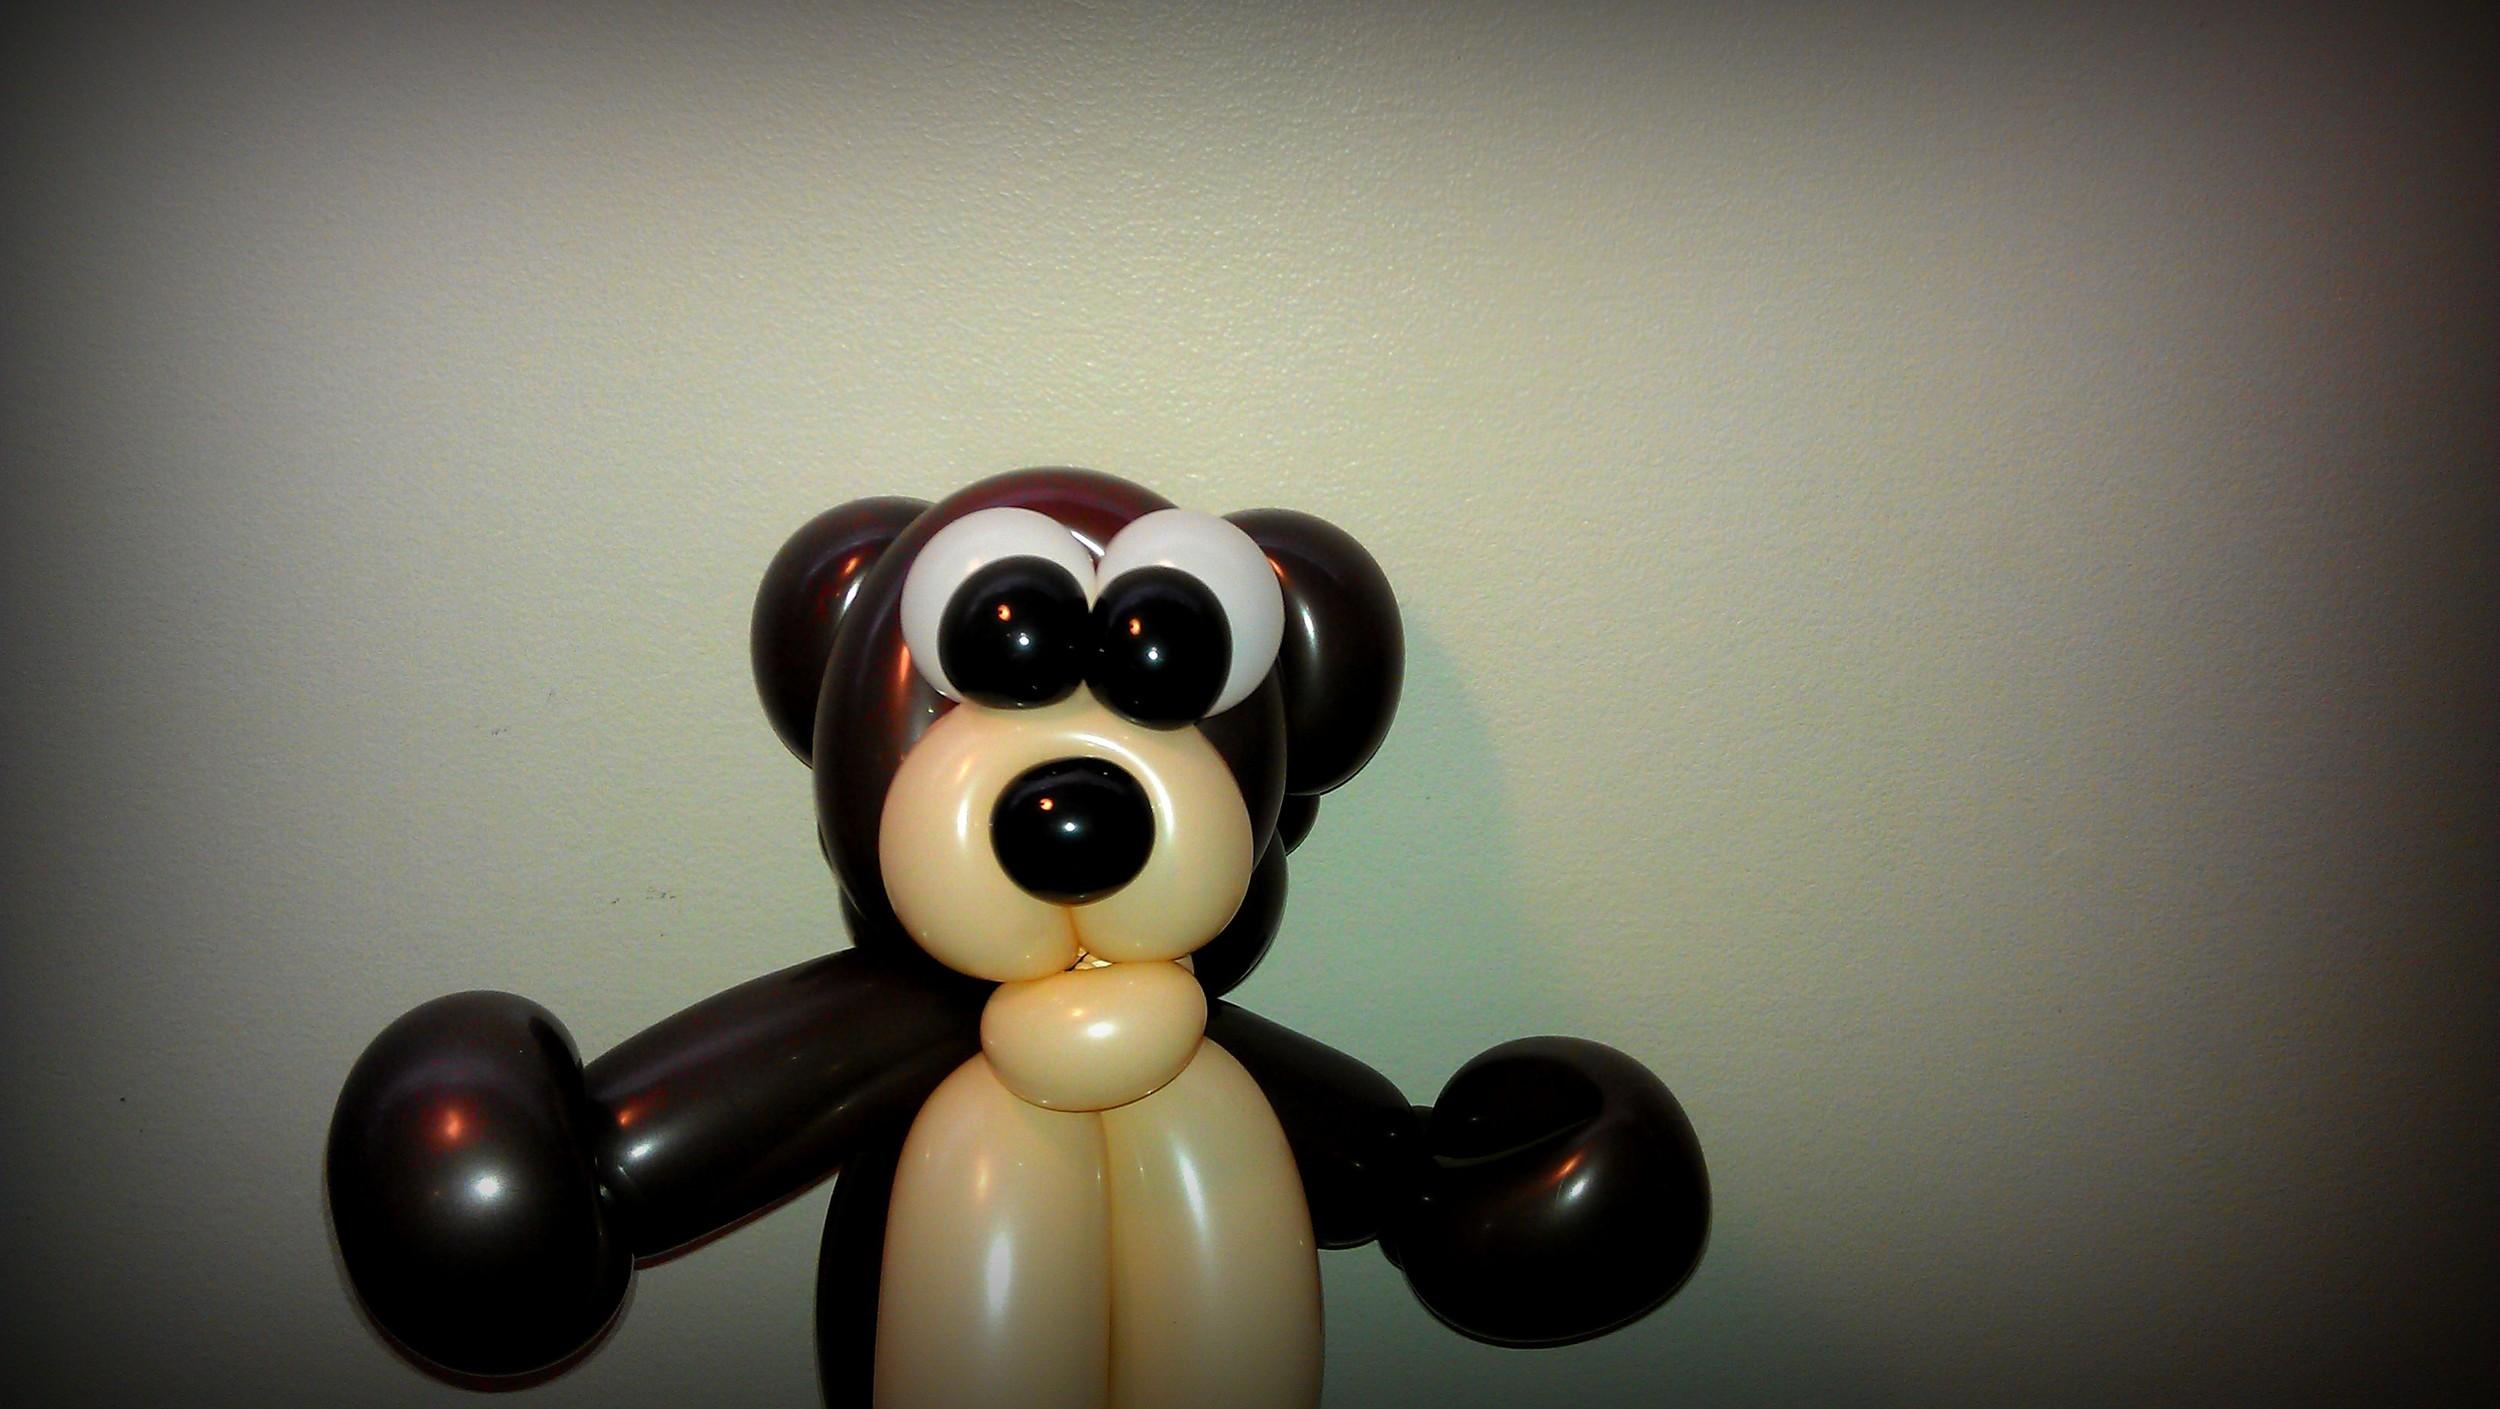 bear balloon.jpg